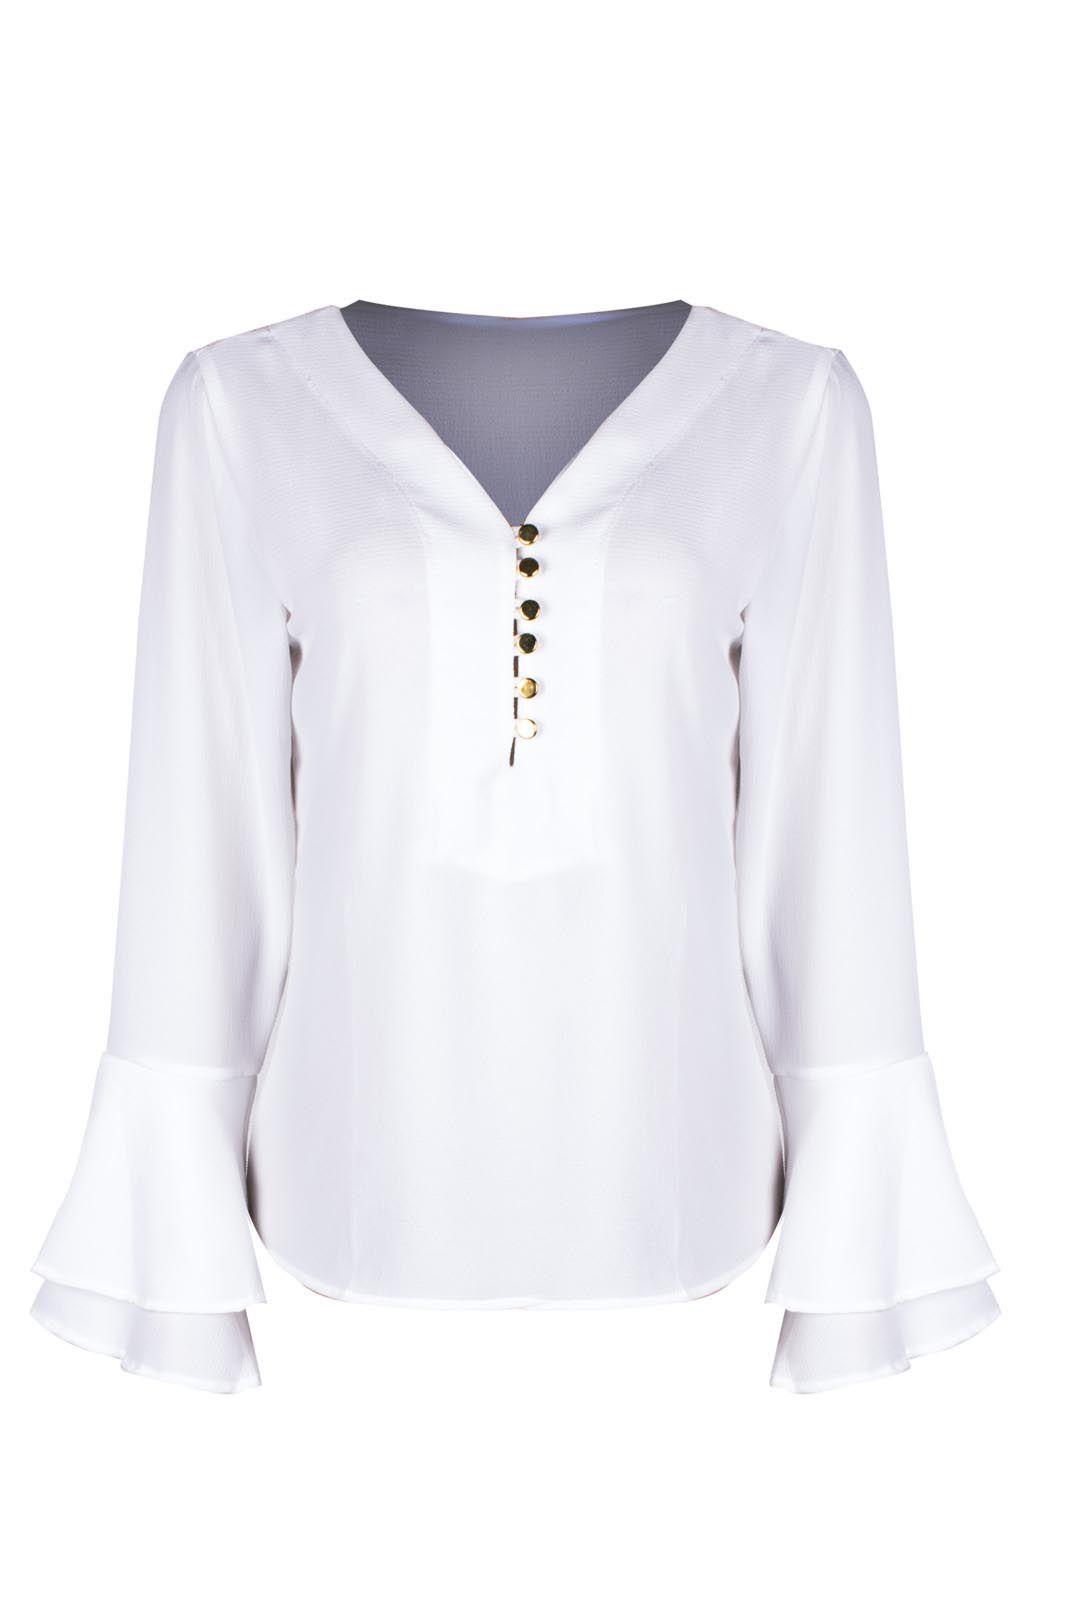 Camisa Outlet Dri Social Básica Crepe Manga Flare 6 Botões Decote Branco